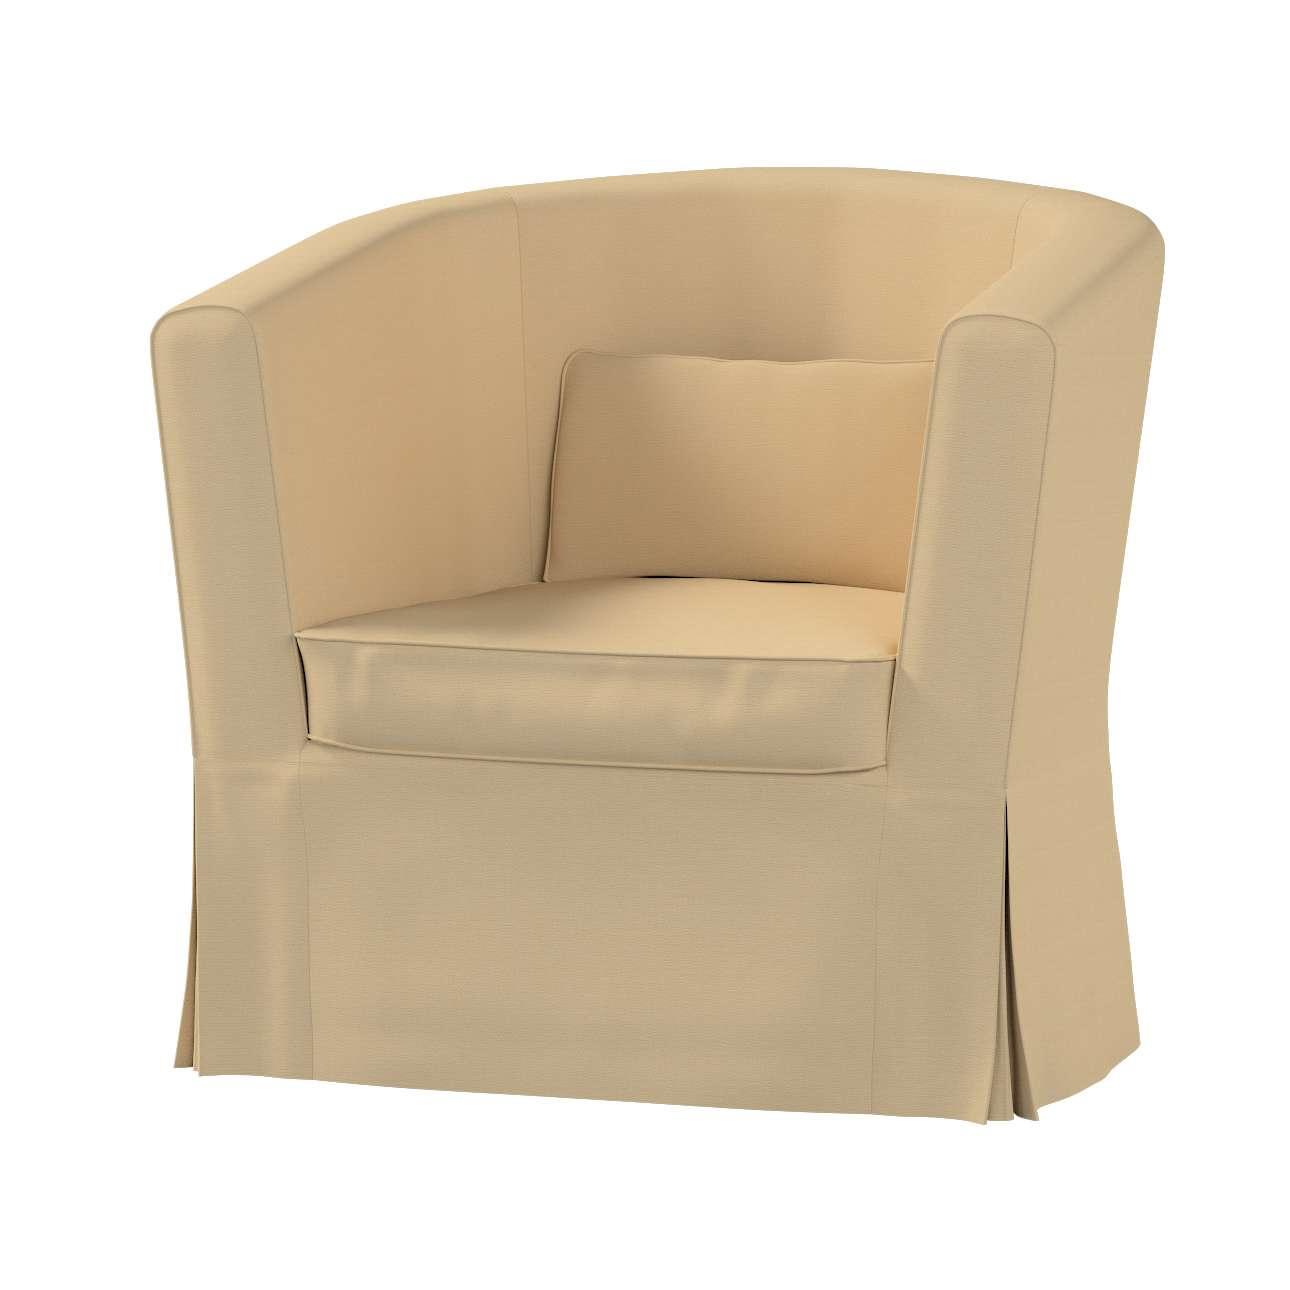 Ektorp Tullsta Sesselbezug Sesselhusse, Ektorp Tullsta von der Kollektion Cotton Panama, Stoff: 702-01